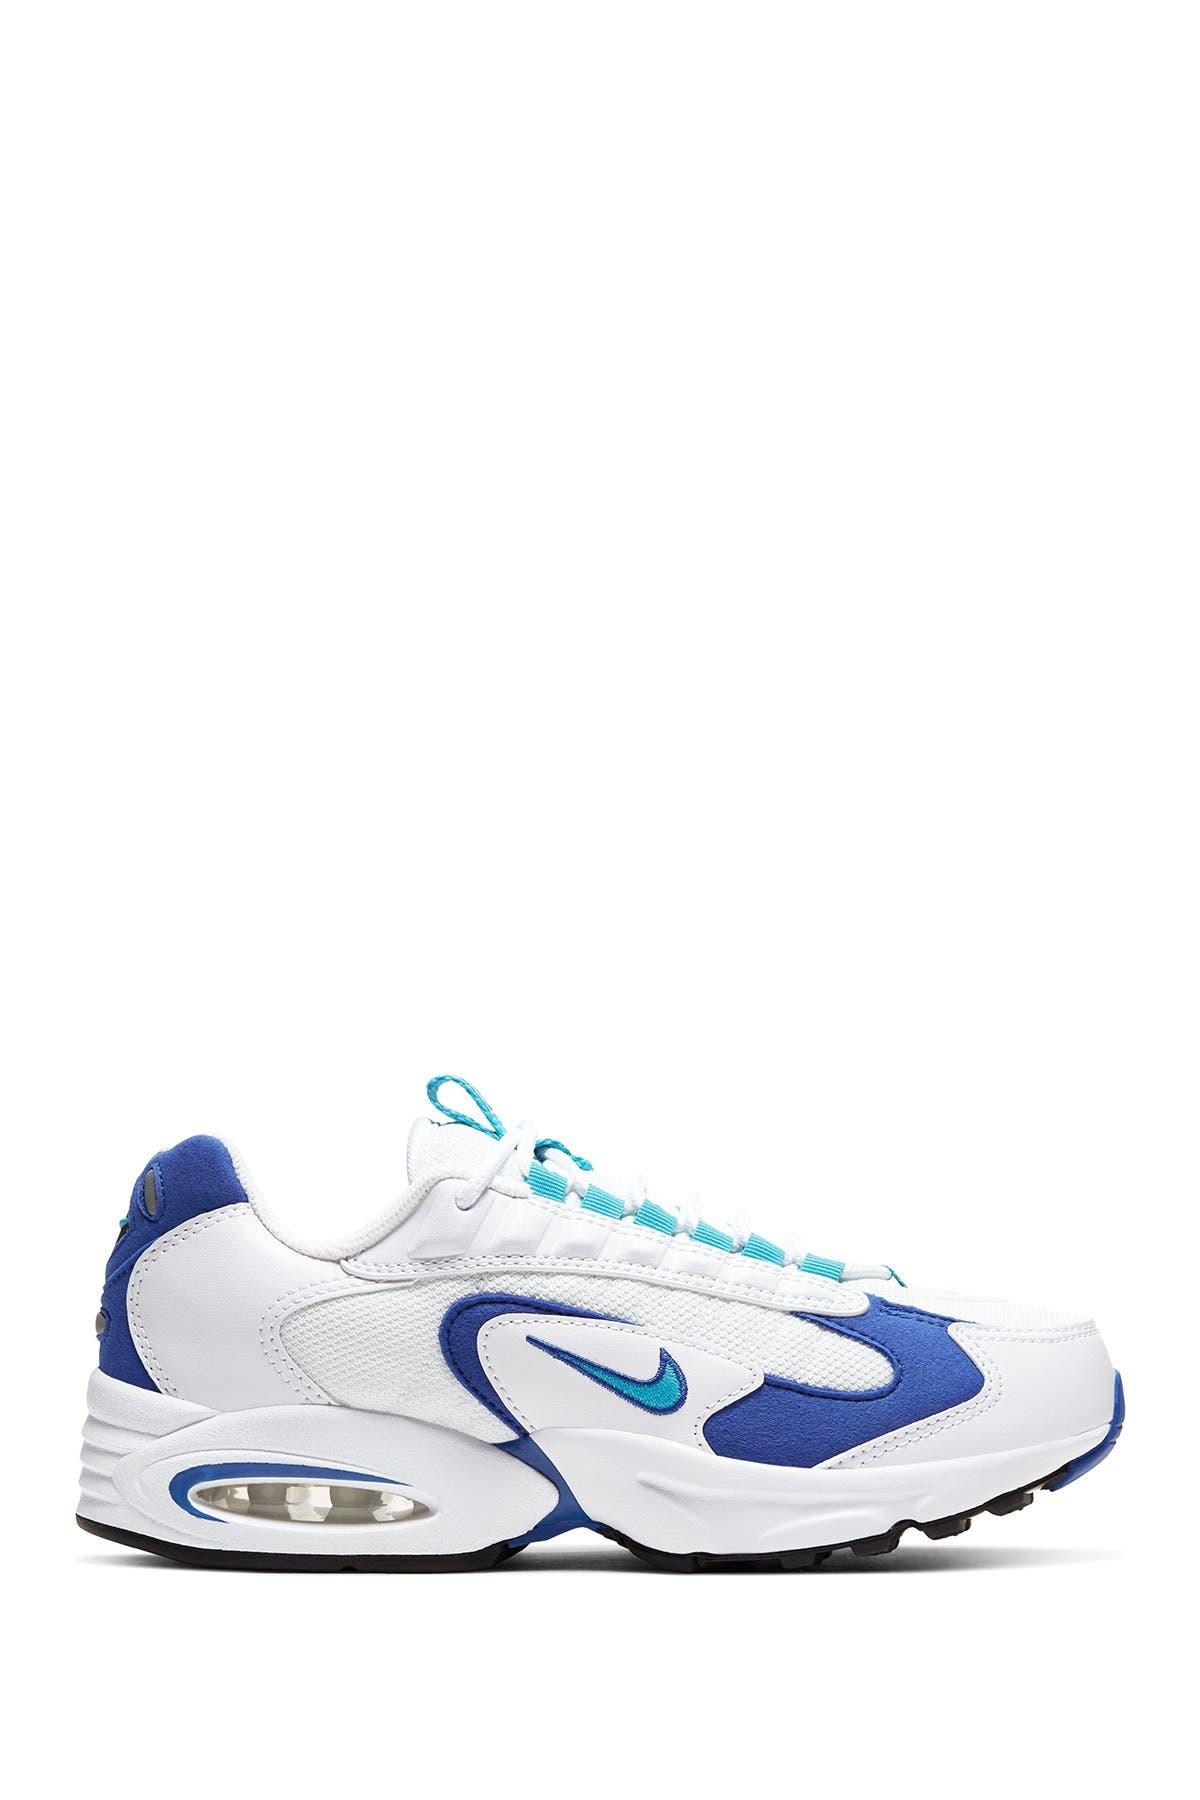 Image of Nike Air Max Triax Sneaker